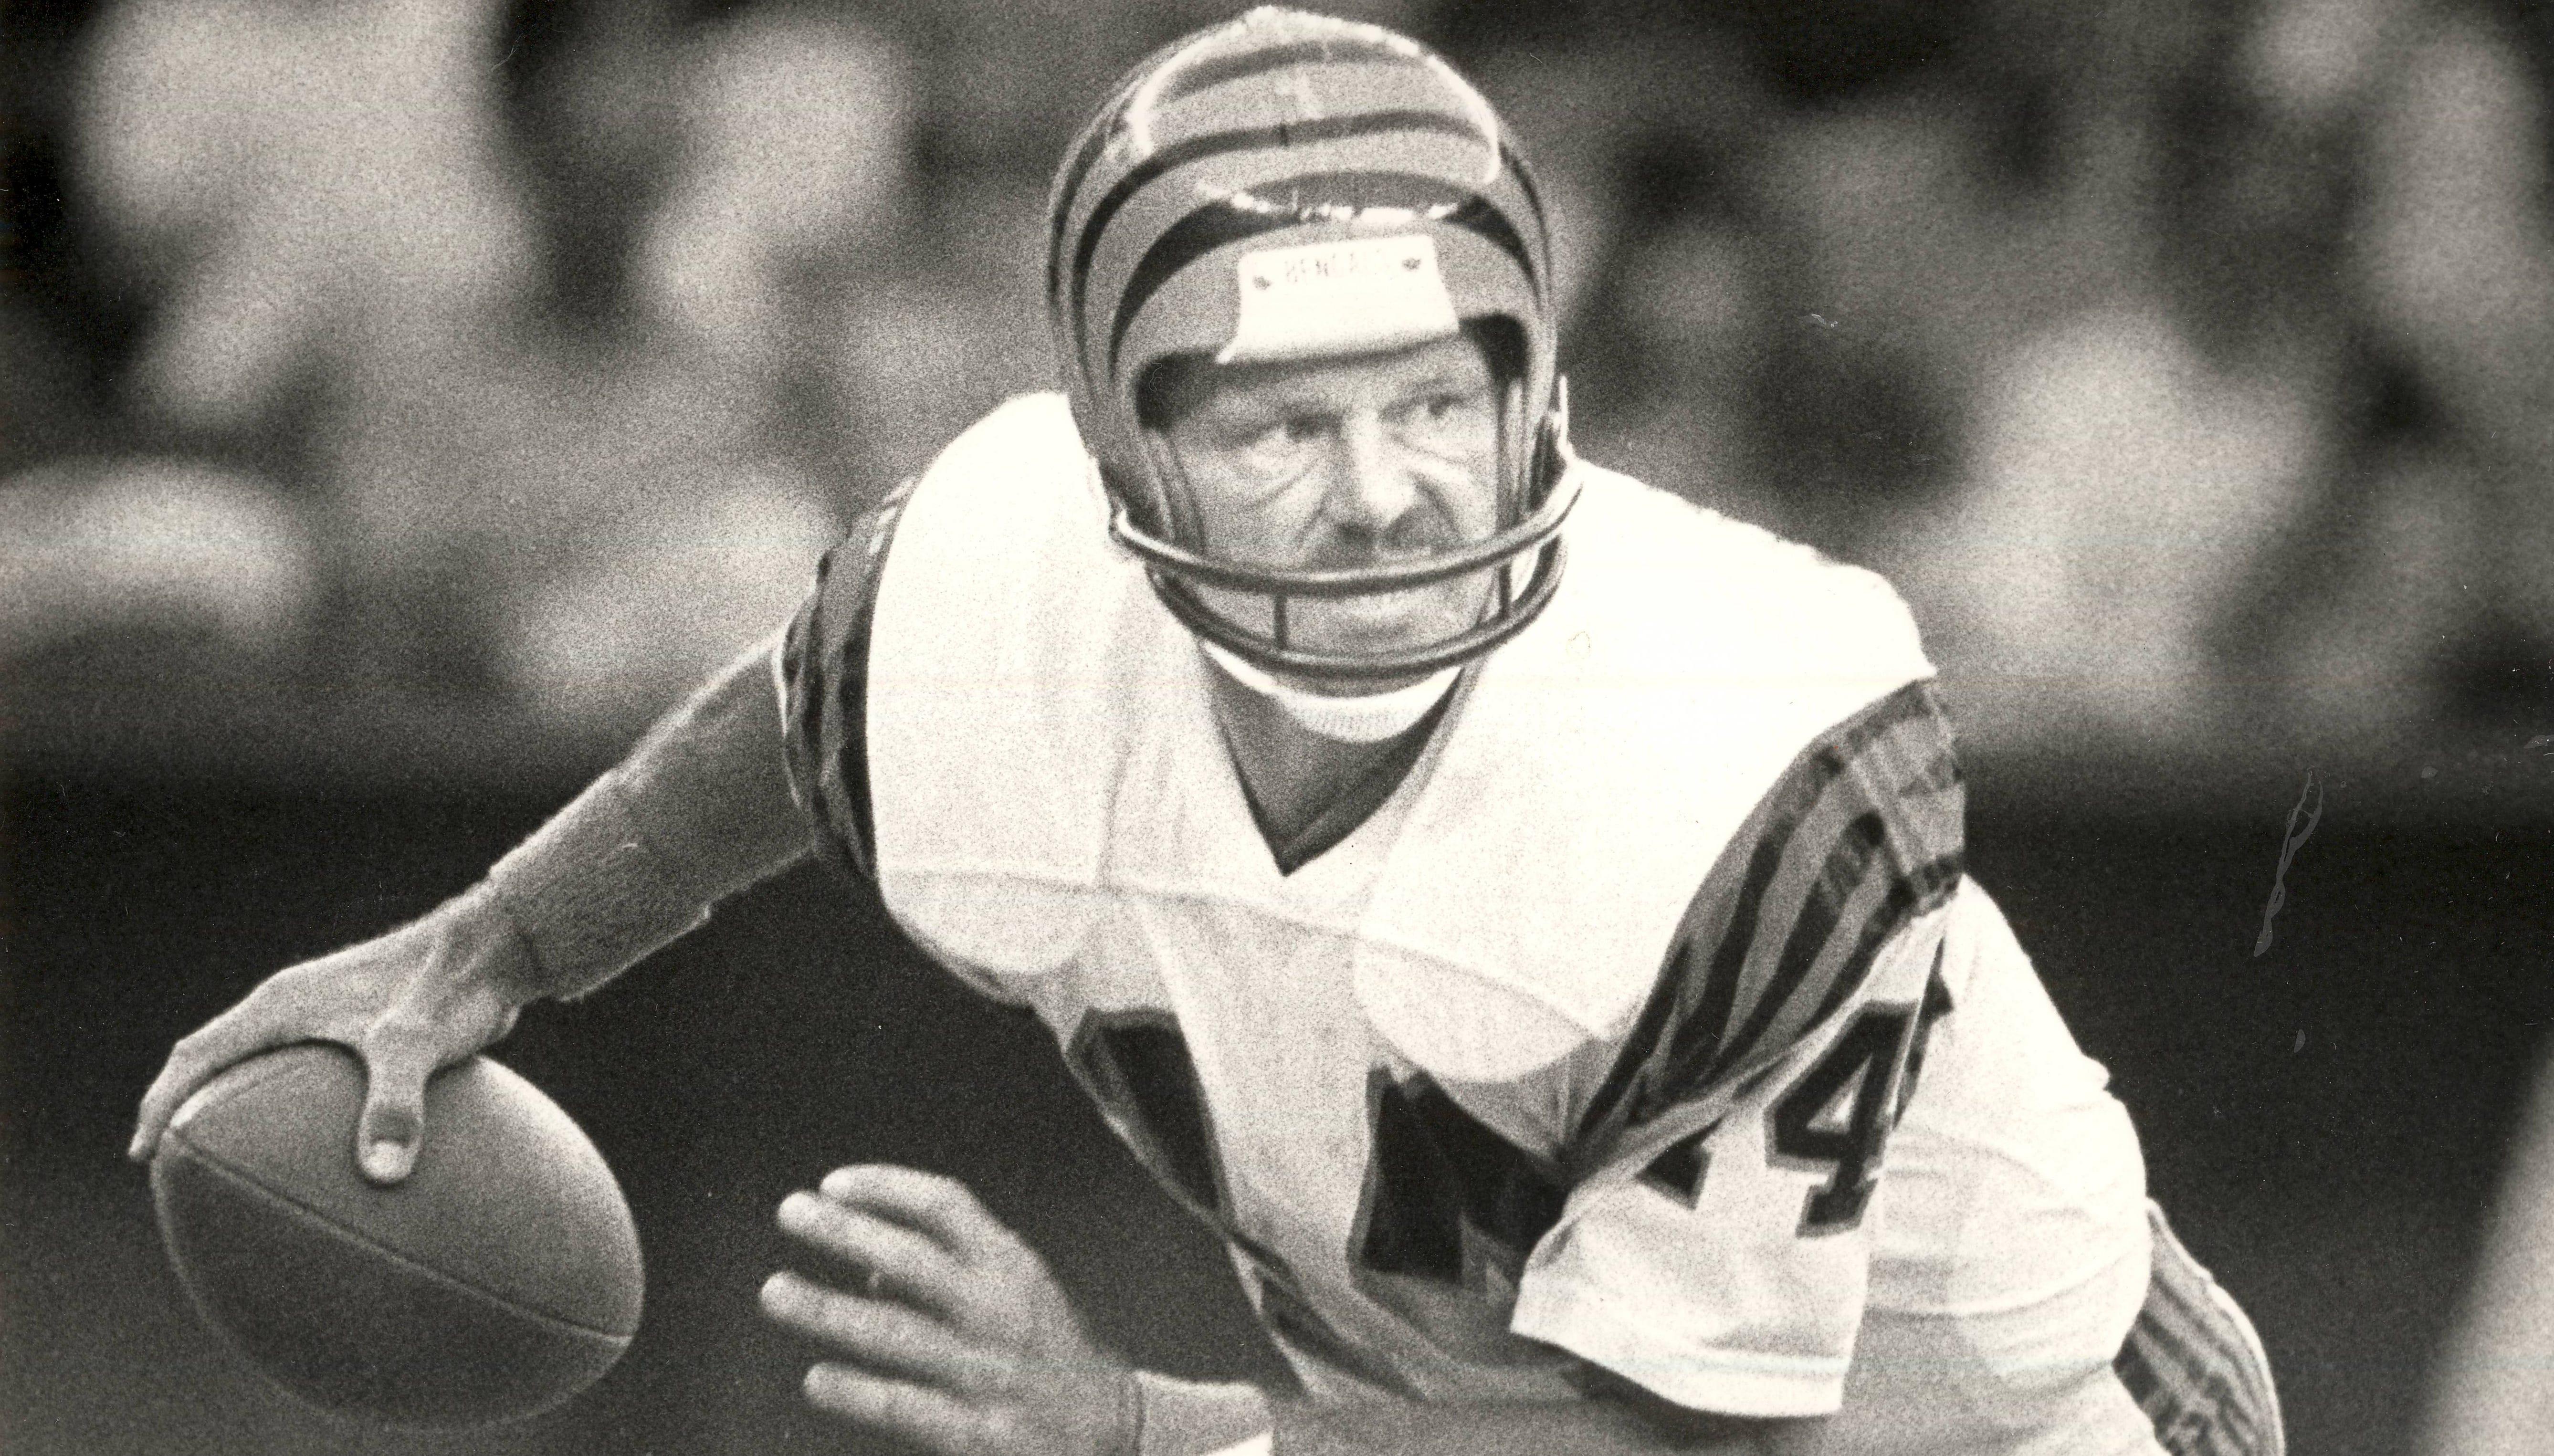 AUGUST 7, 1983: The Kansas City Chiefs pass rush had Bengals quarterback Ken Anderson on the run at Riverfront Stadium.